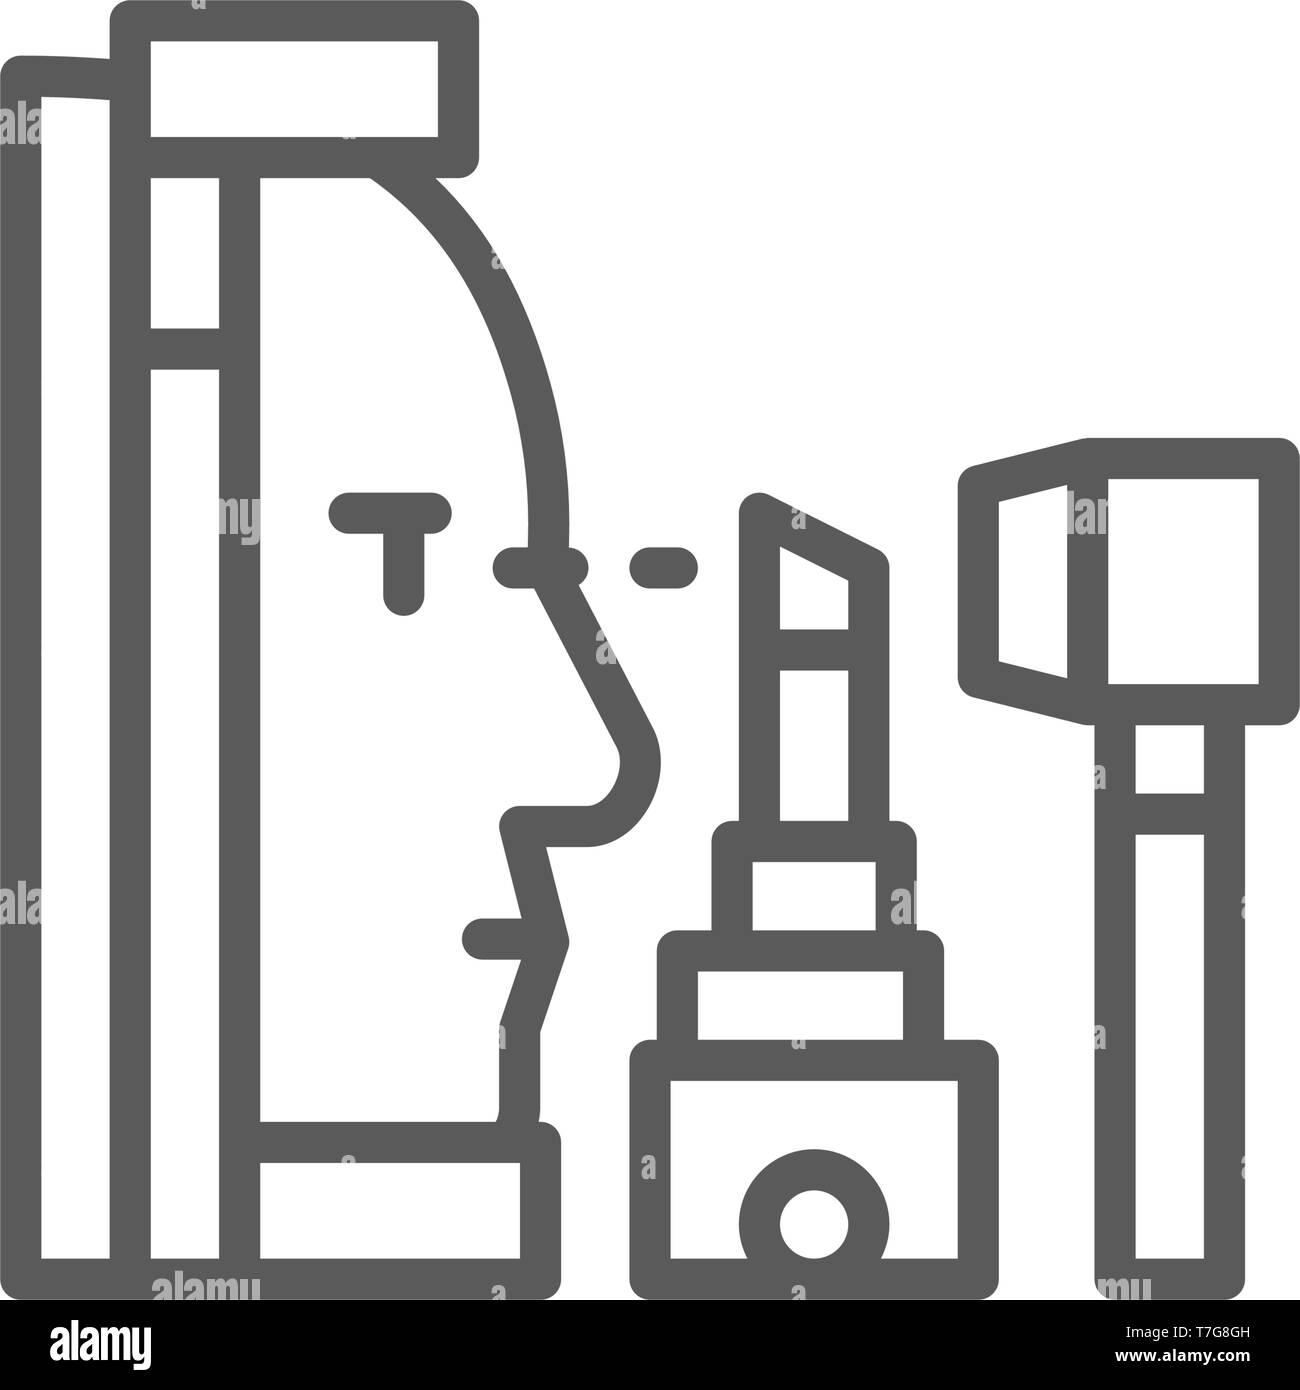 Vision testing, laser correction line icon. - Stock Image